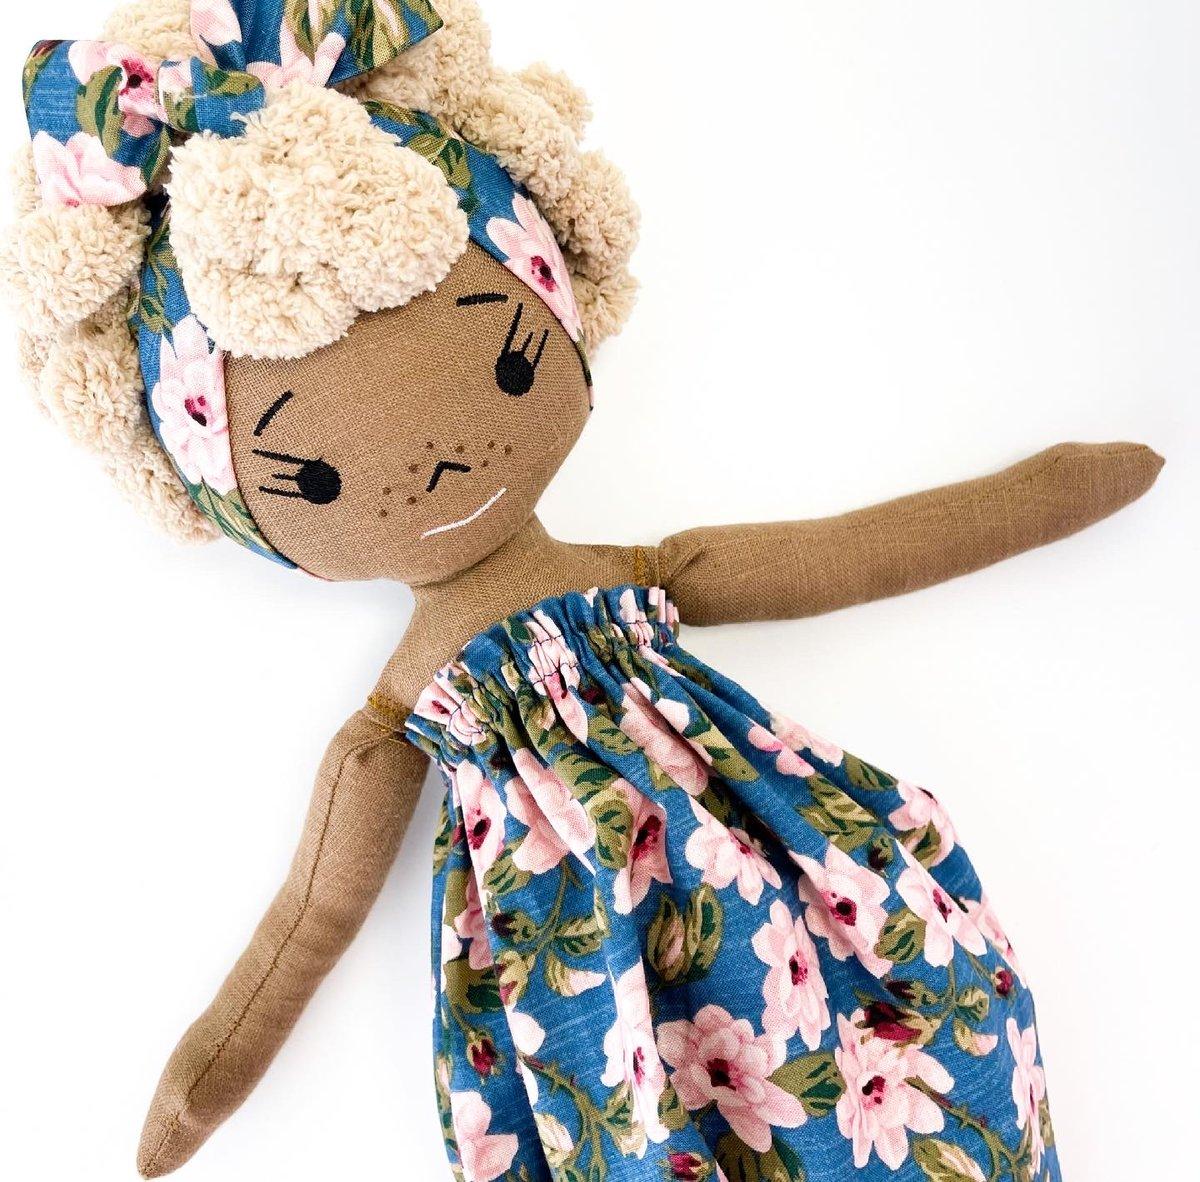 Simone More to Love Handmade Linen Doll (Waitlist Preorder Item - ship date Oct 1-Mar 30,2022)